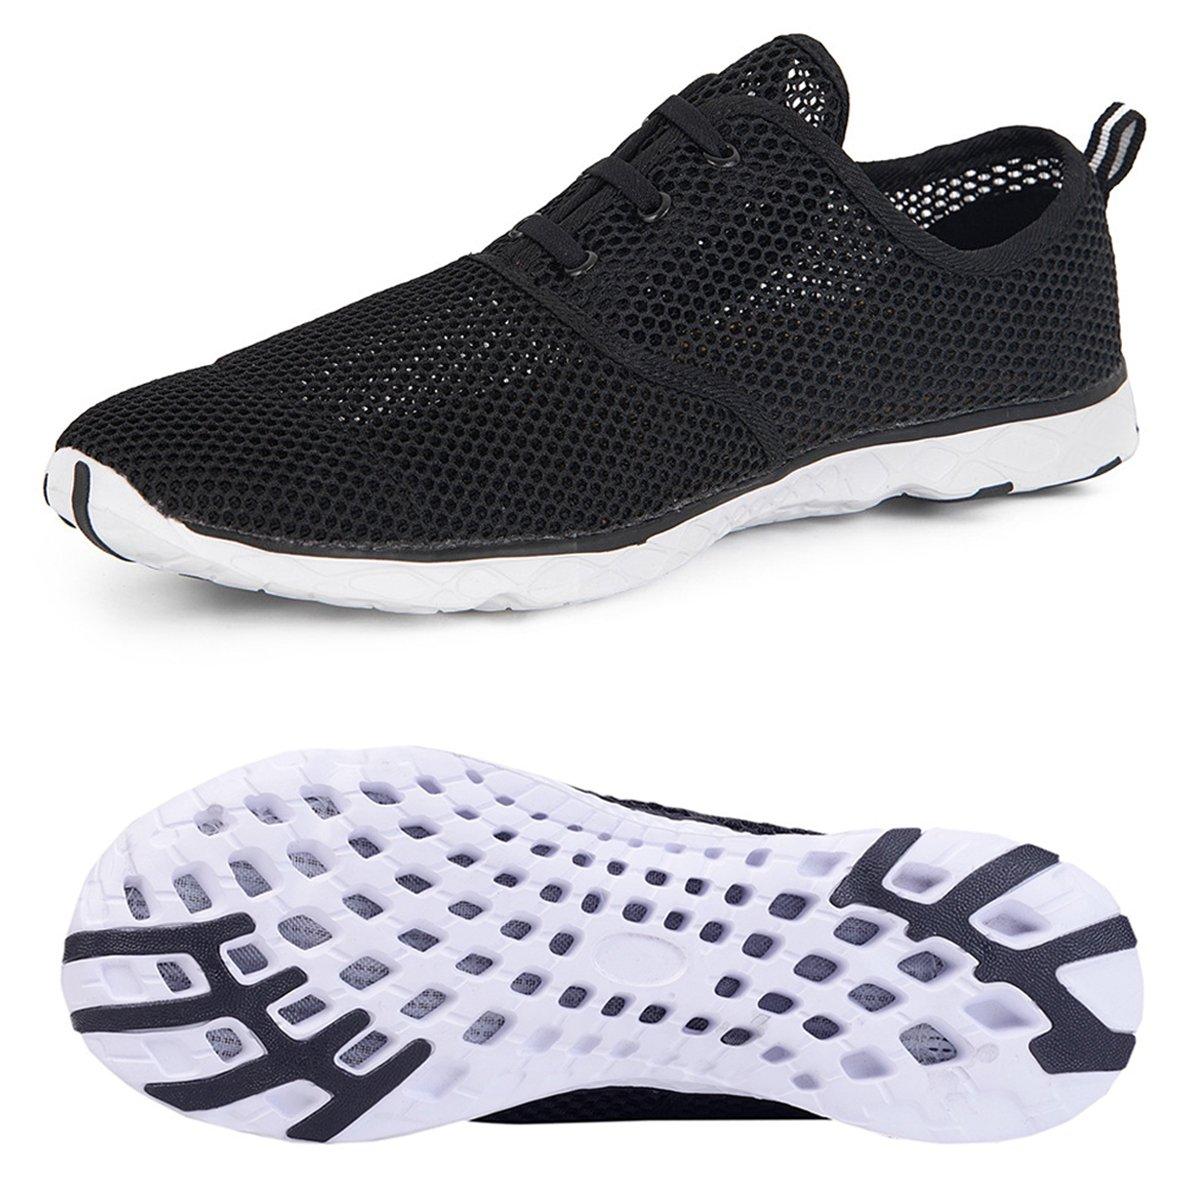 Water Shoes for Men Quick Drying Aqua Shoes Beach Pool Shoes (Black, 45)